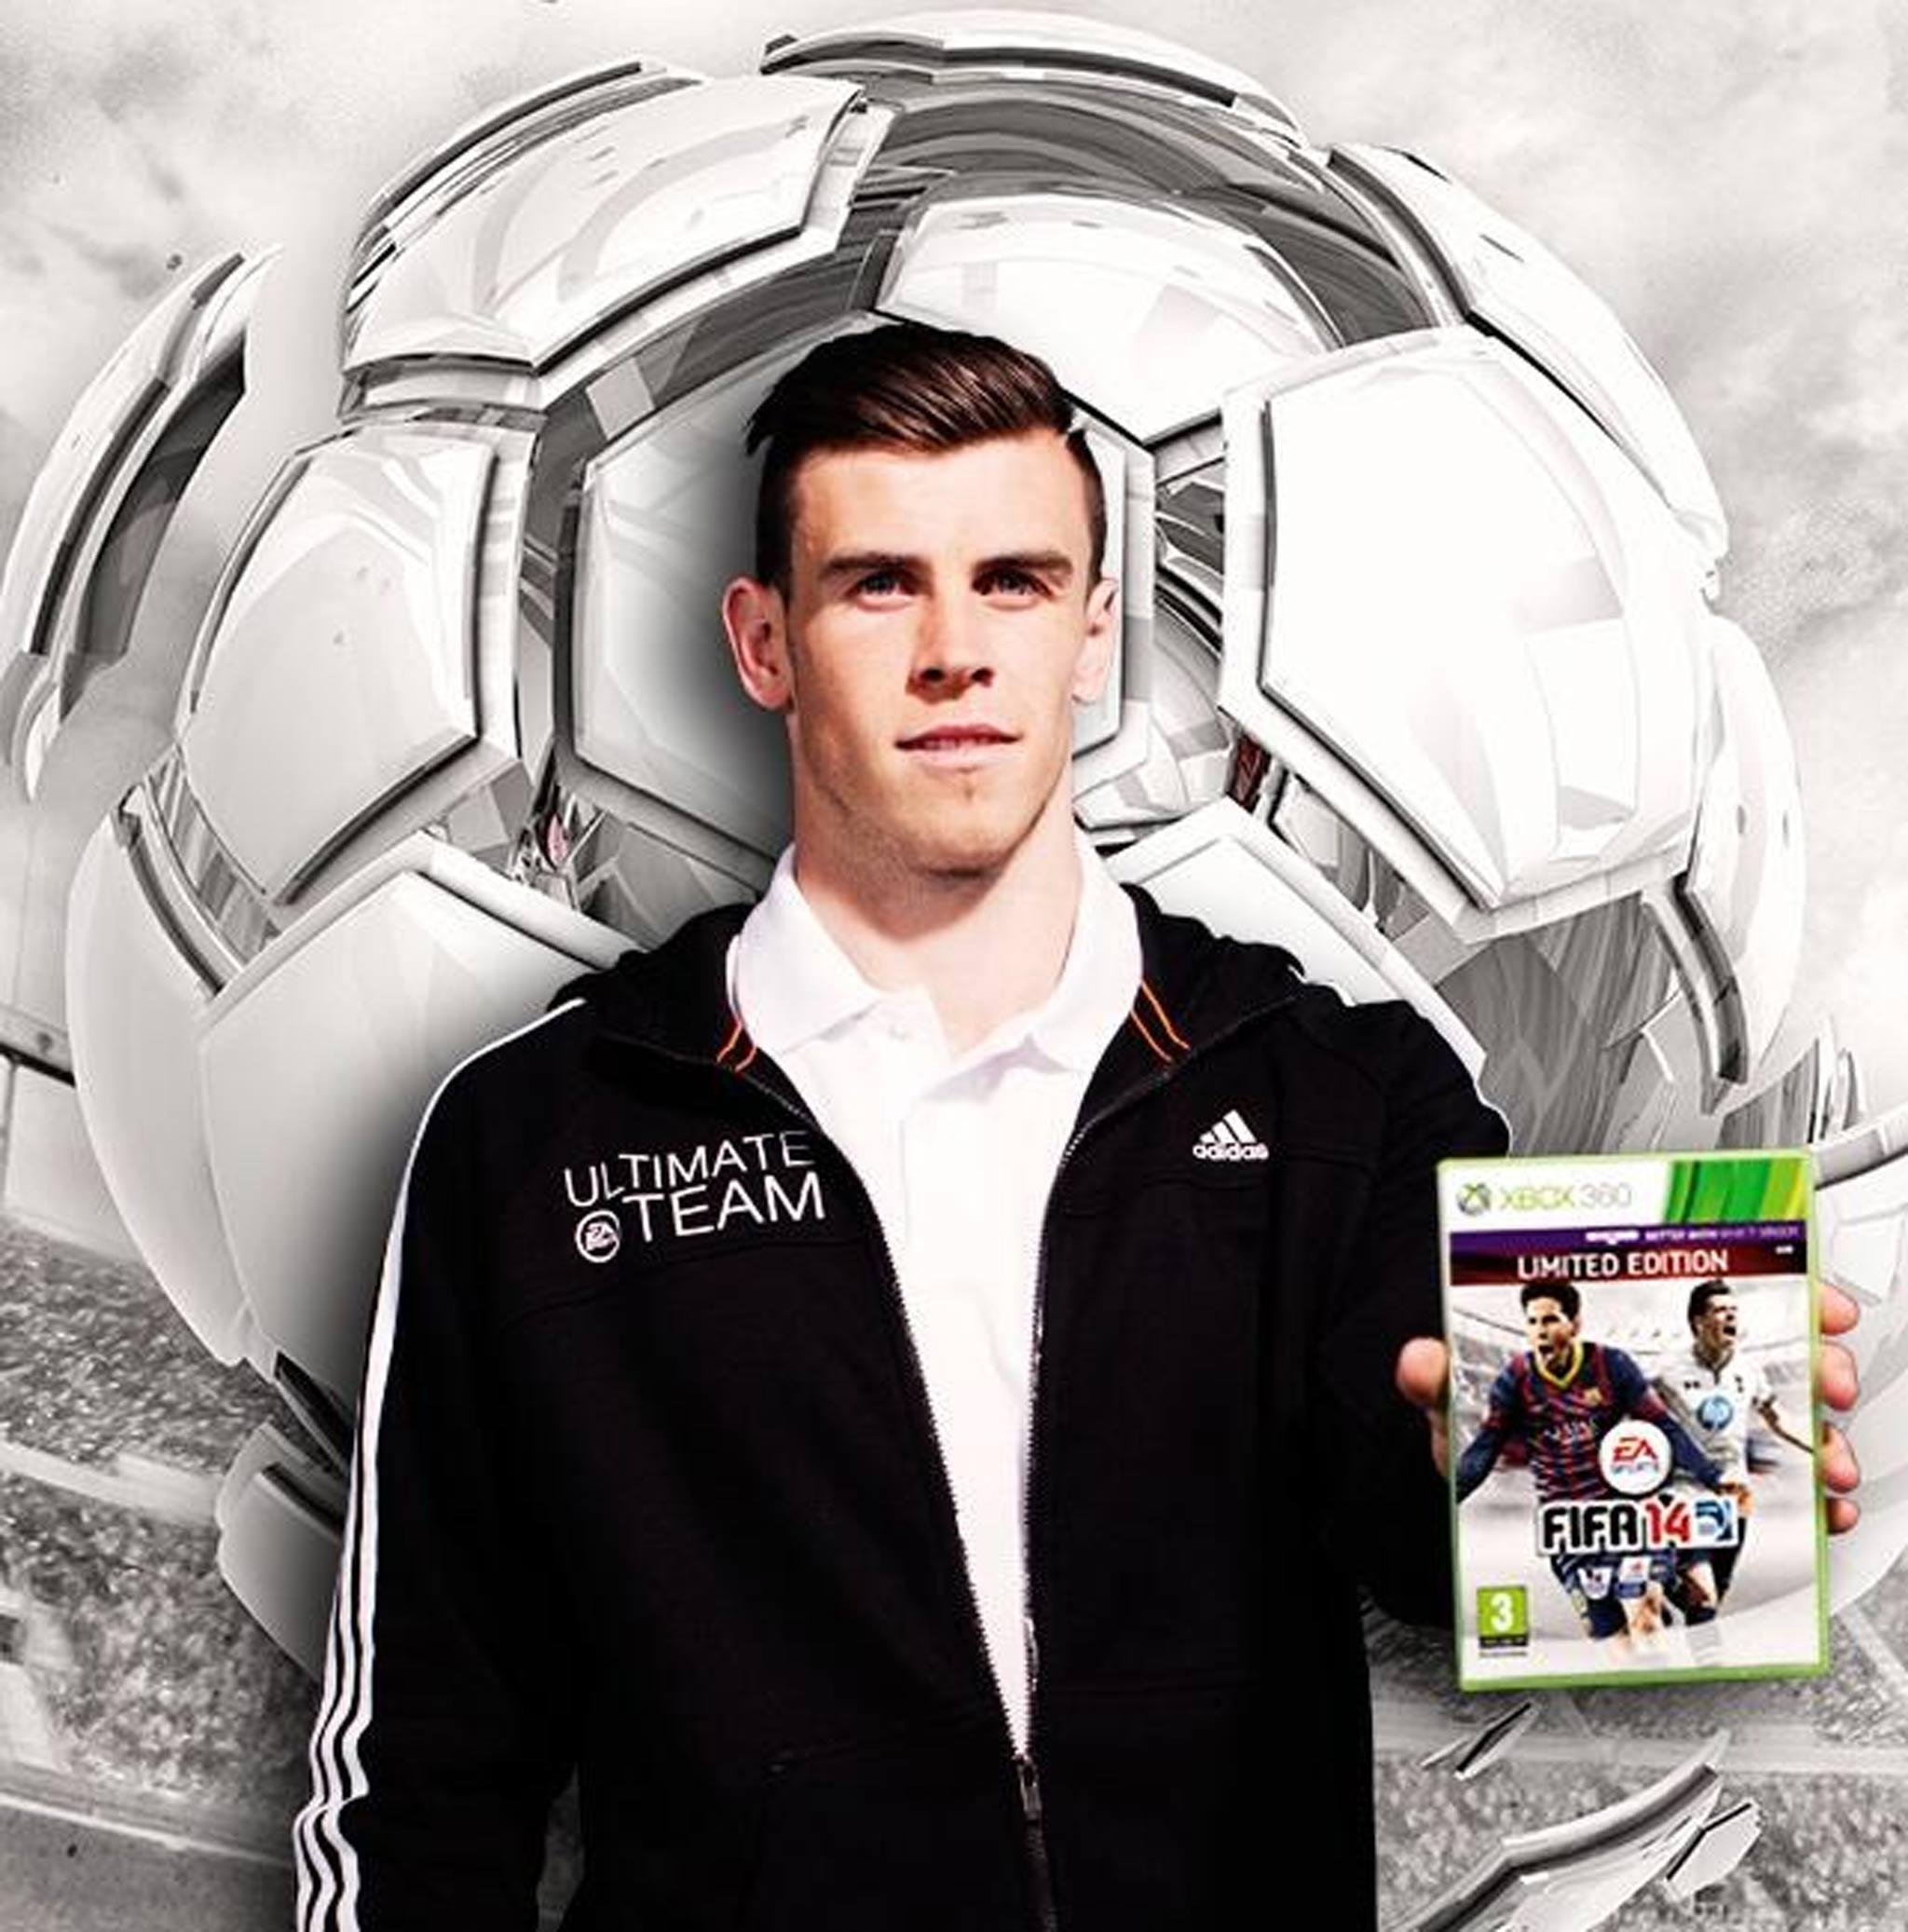 Fifa 14 Hungary Home: Fifa 14: Tottenham Forward Gareth Bale Selected To Appear